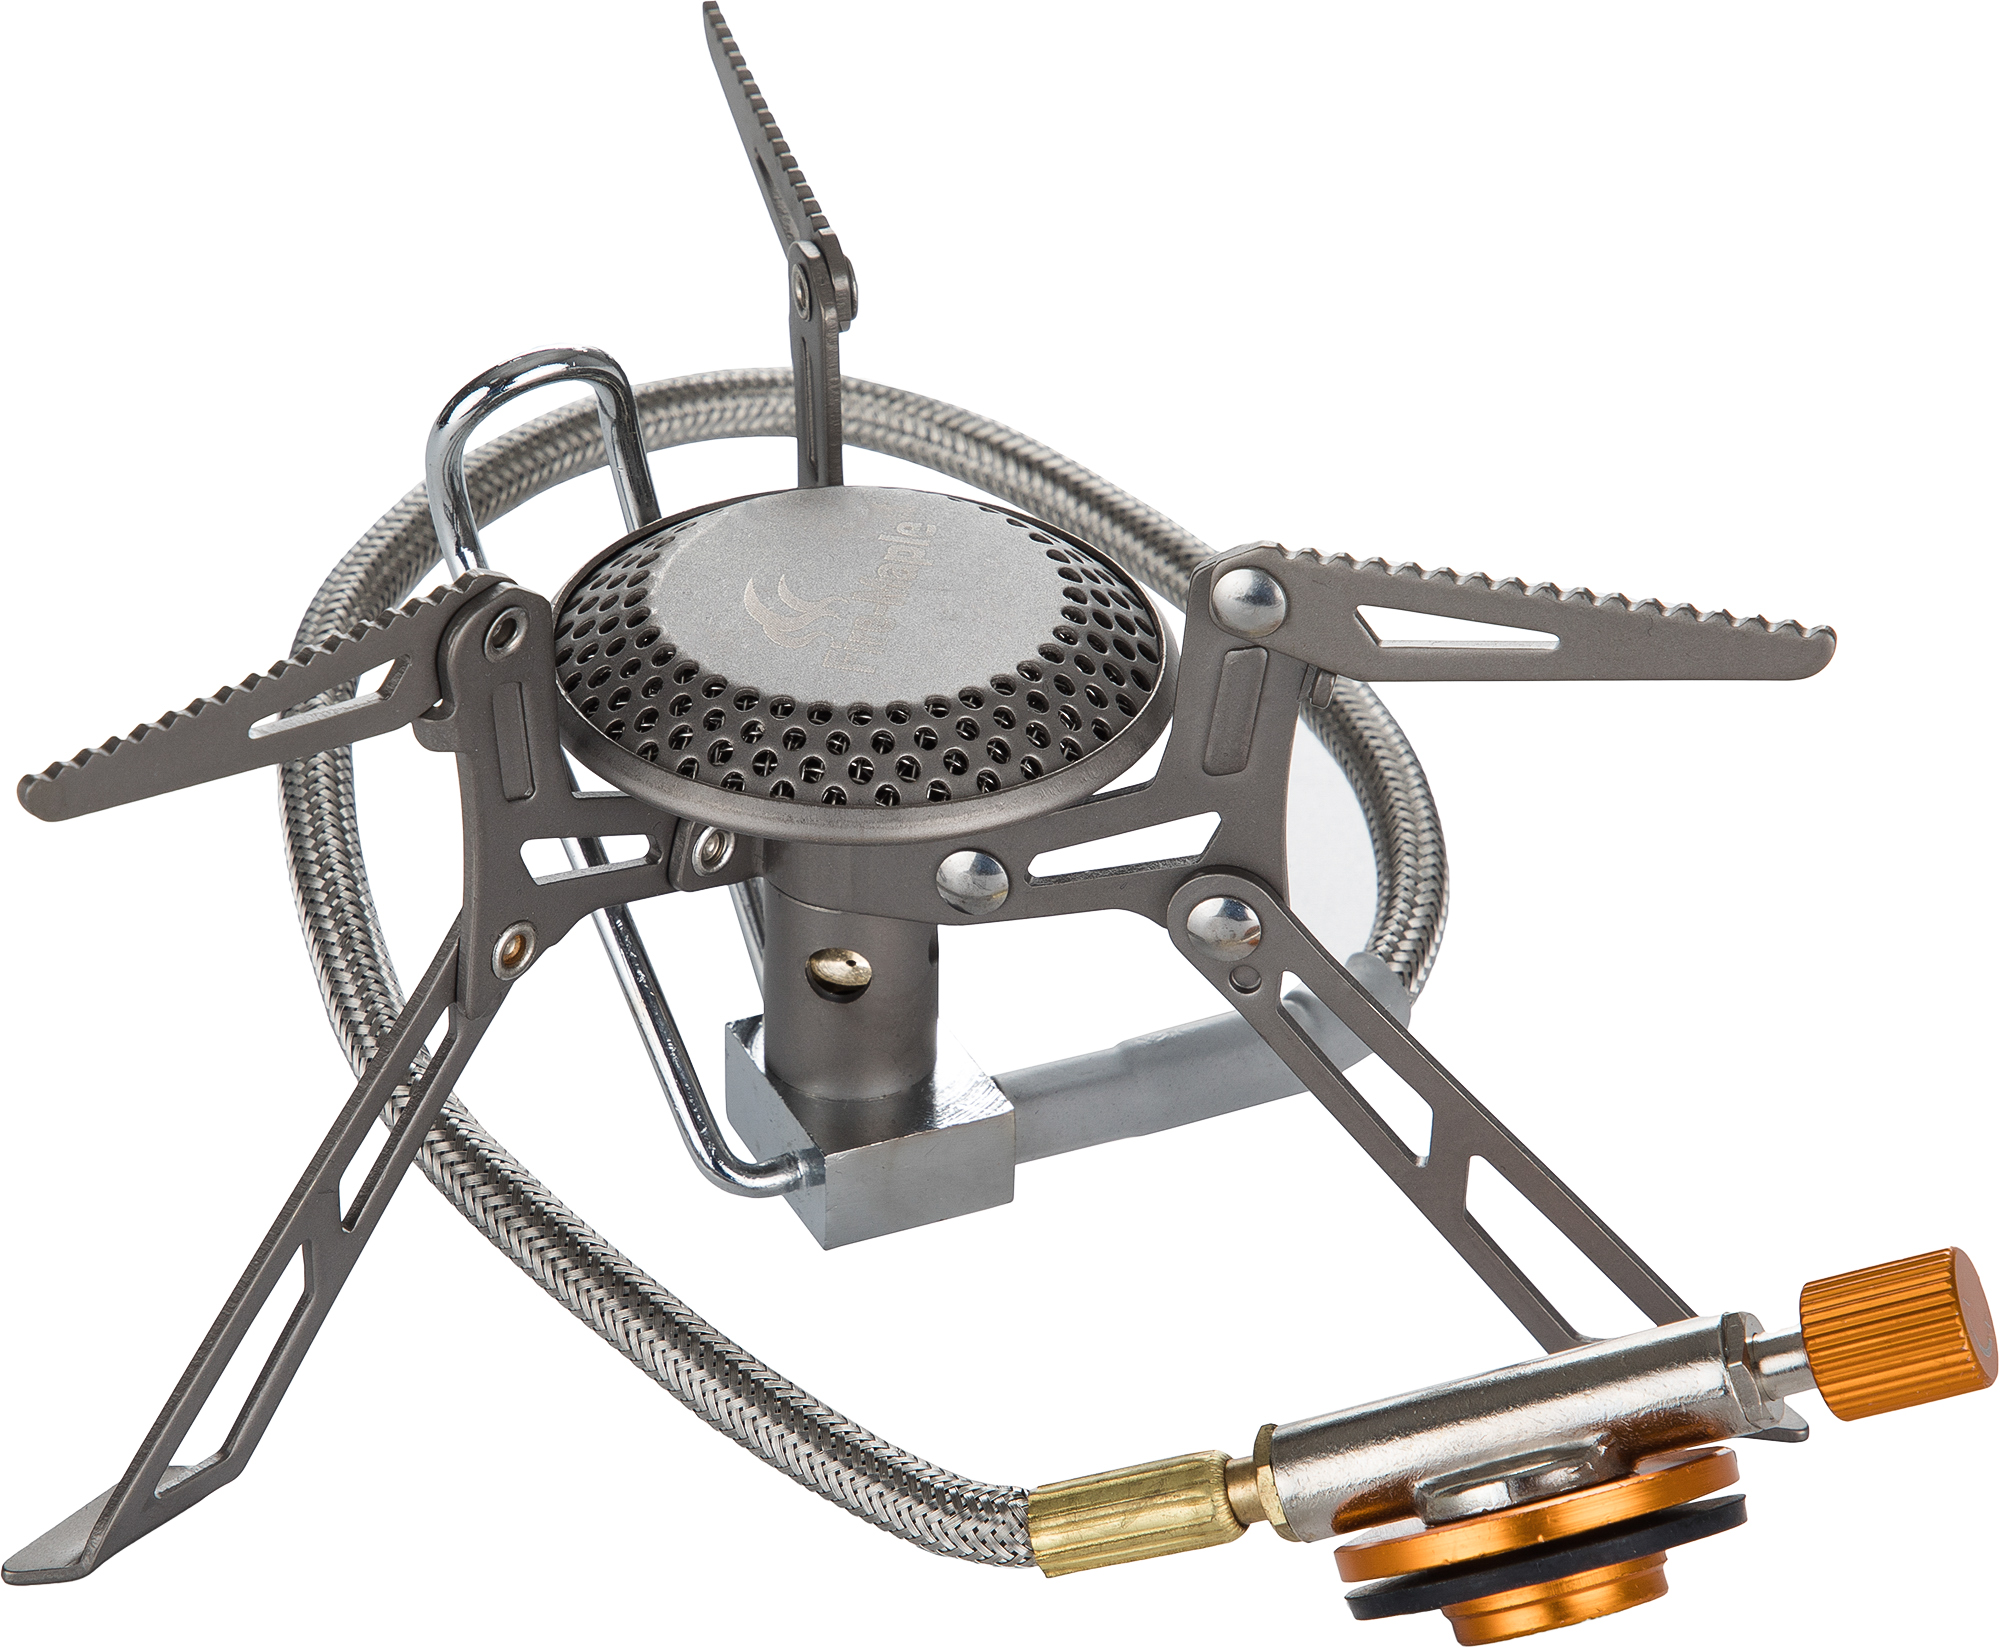 Fire-Maple Горелка газовая портативная Fire-Maple BLADE 2